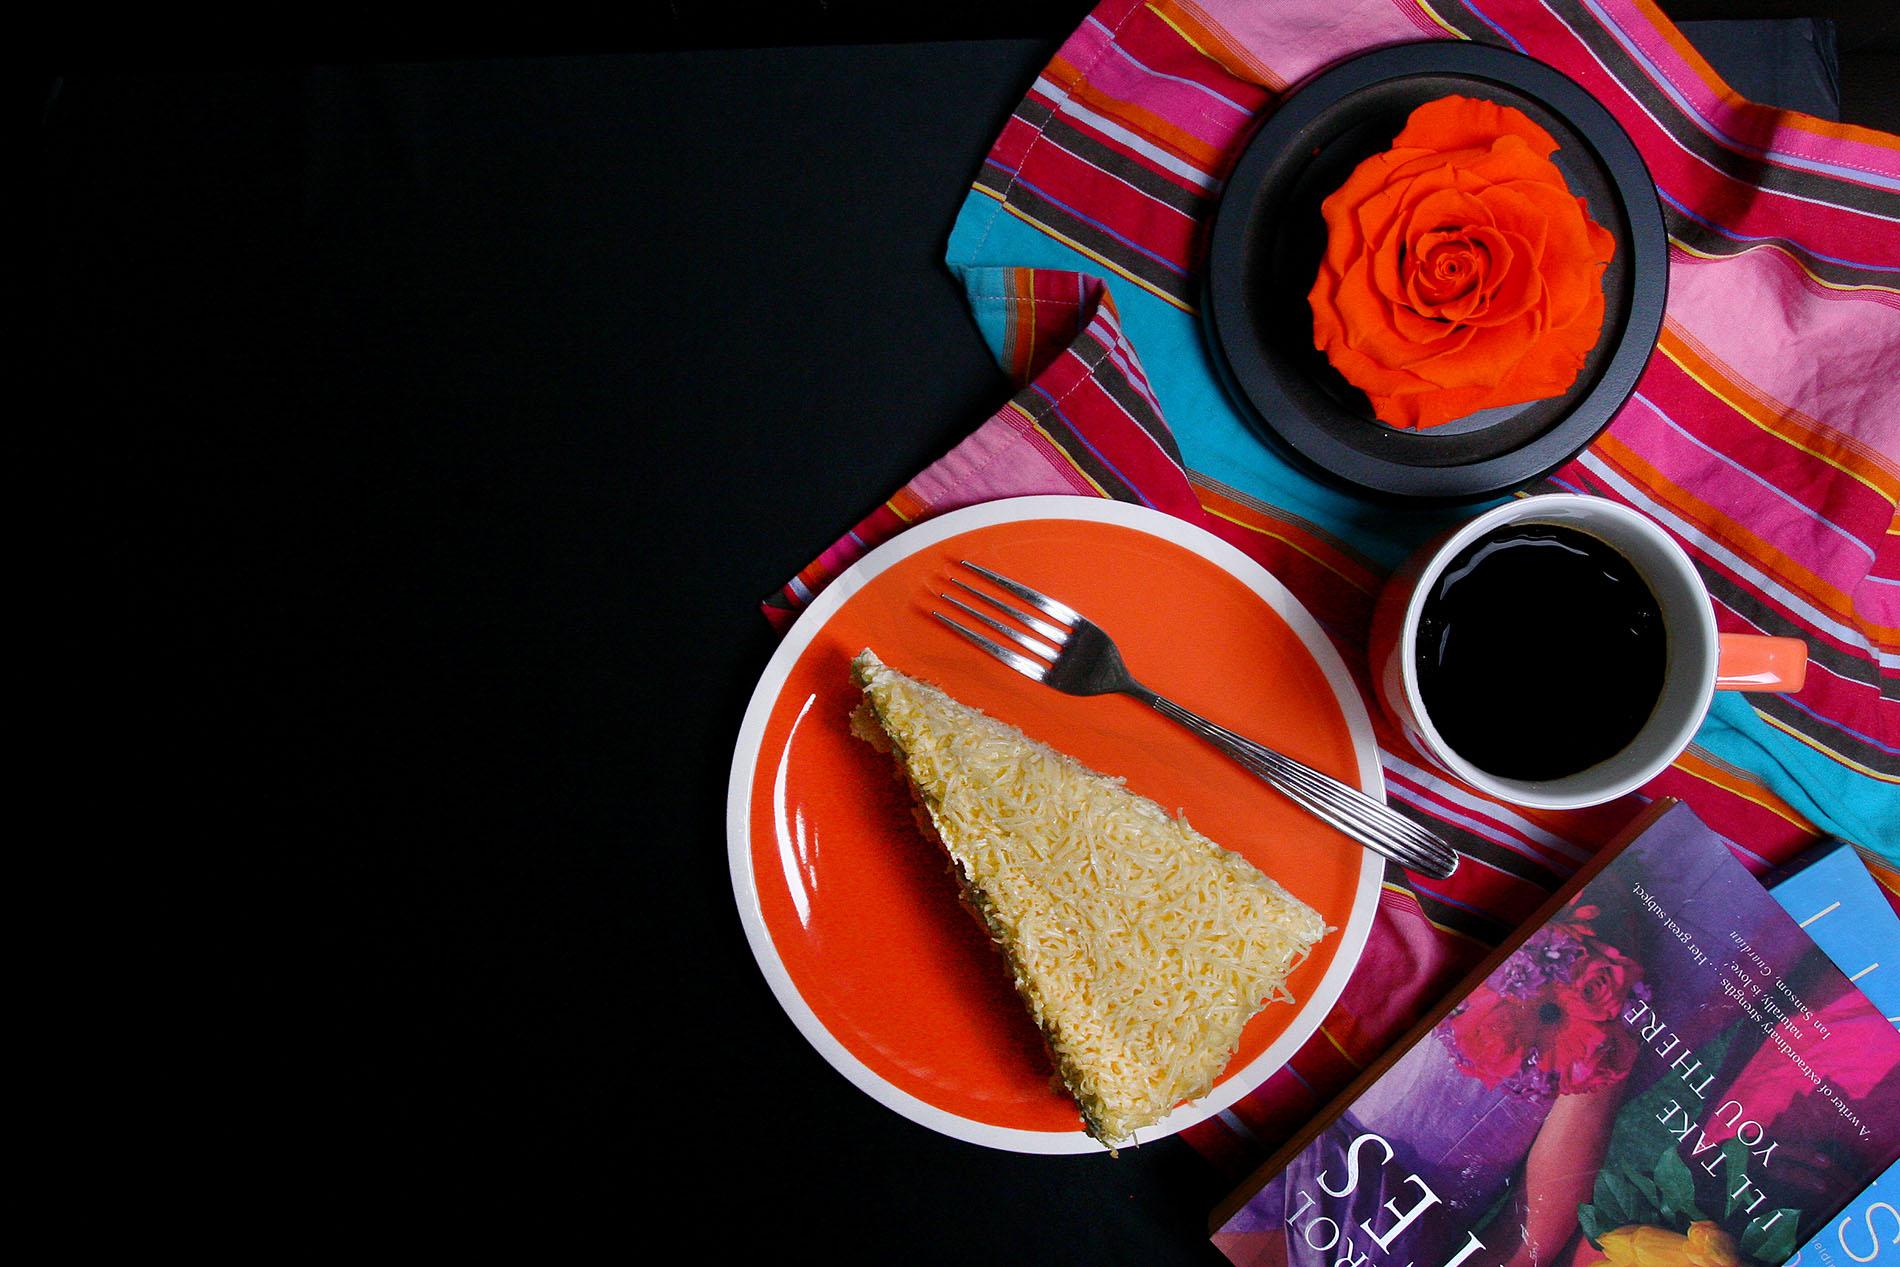 Petals by Carmille Cakes 4